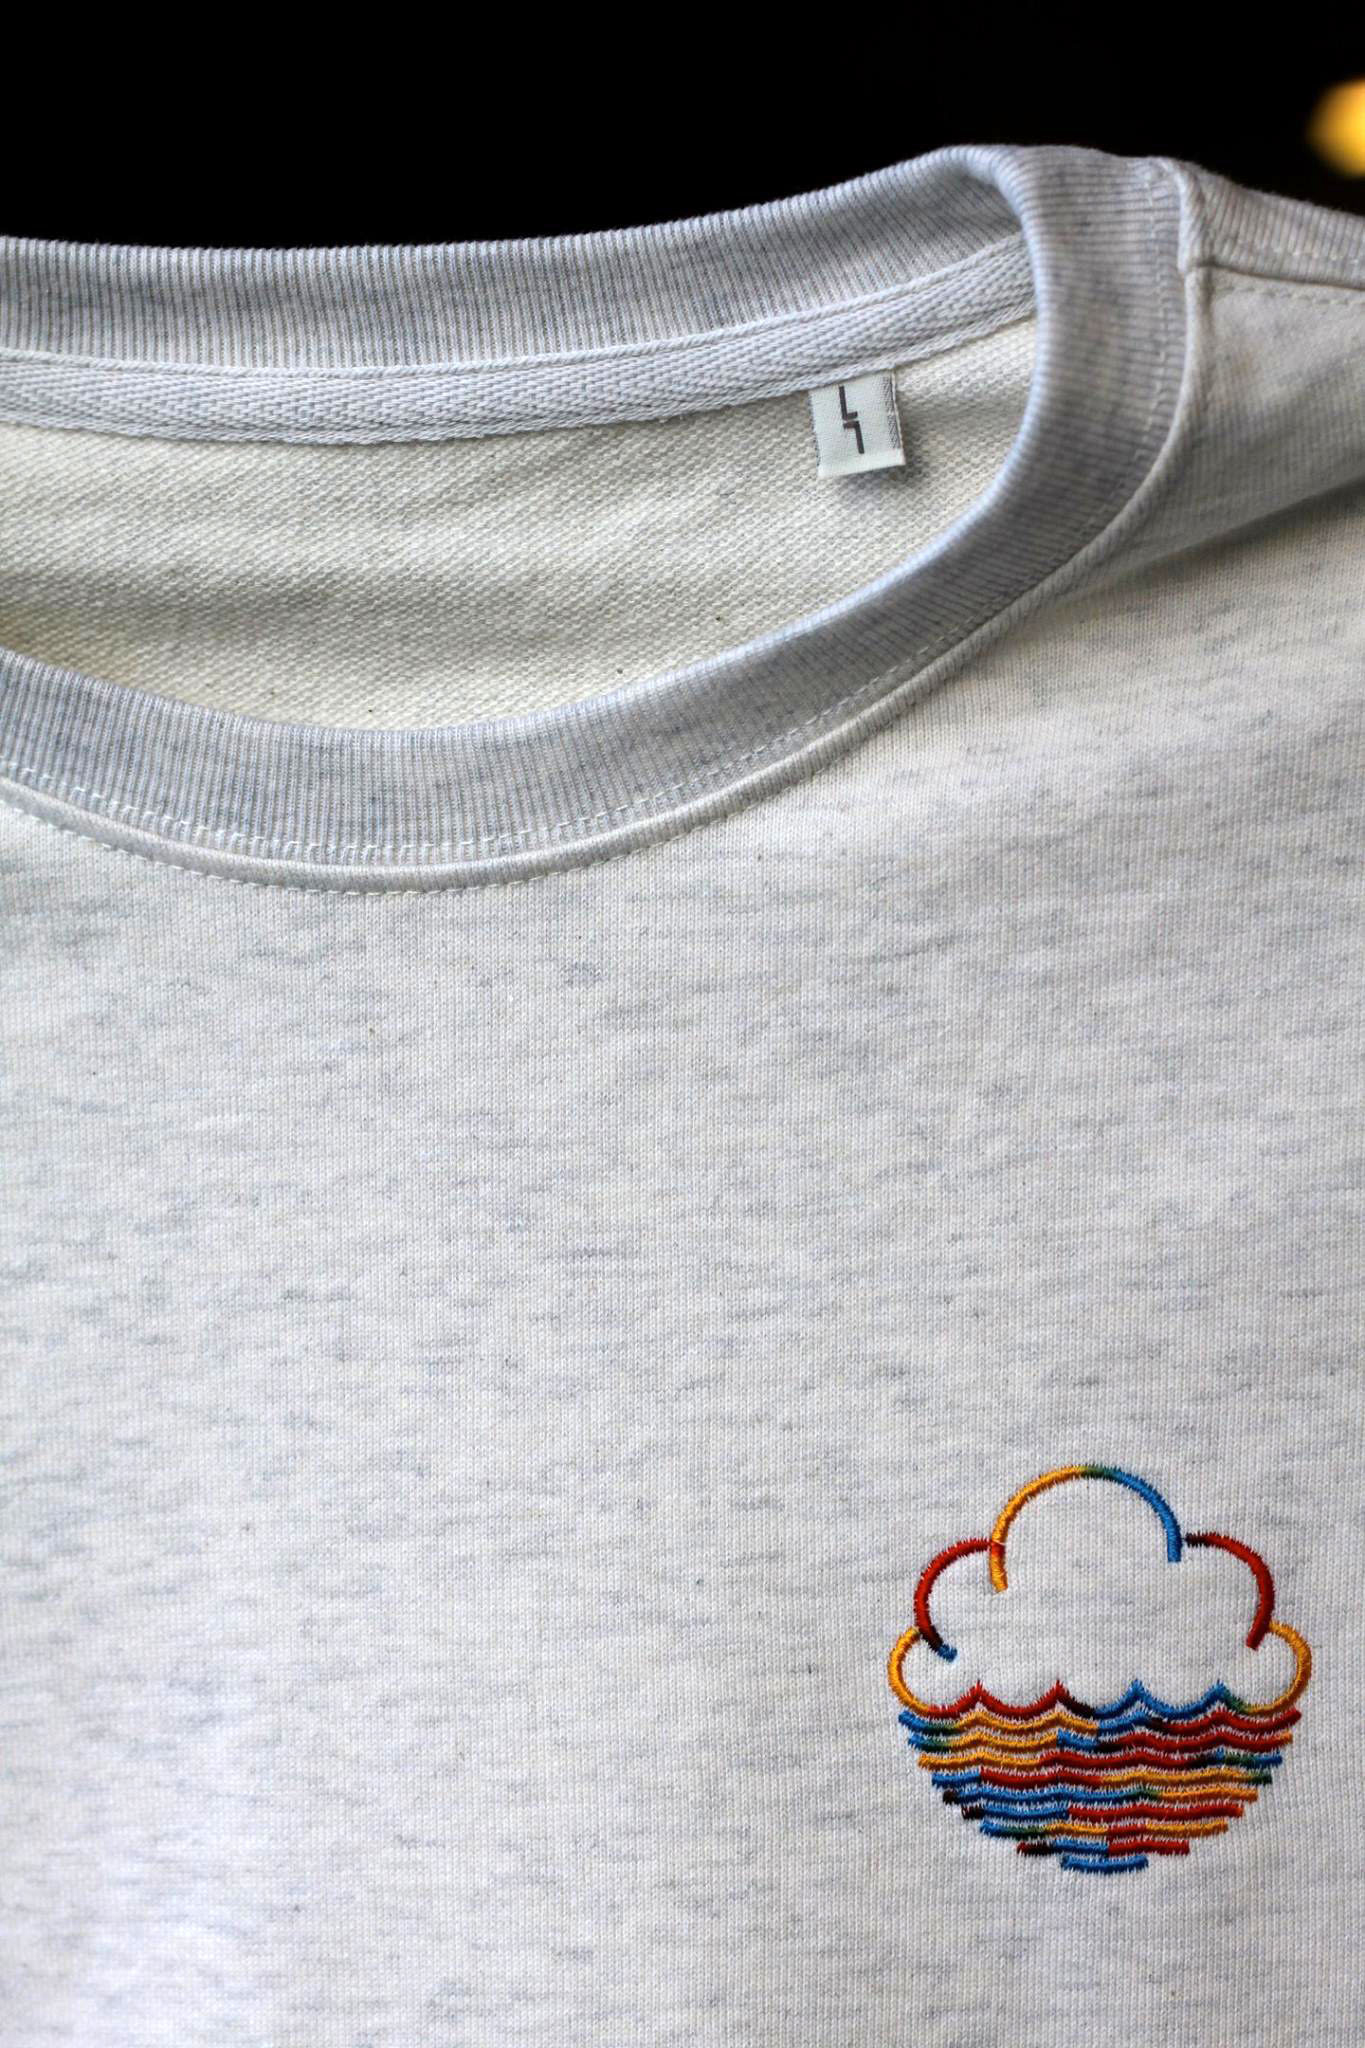 Cloudwater-shirt.jpg